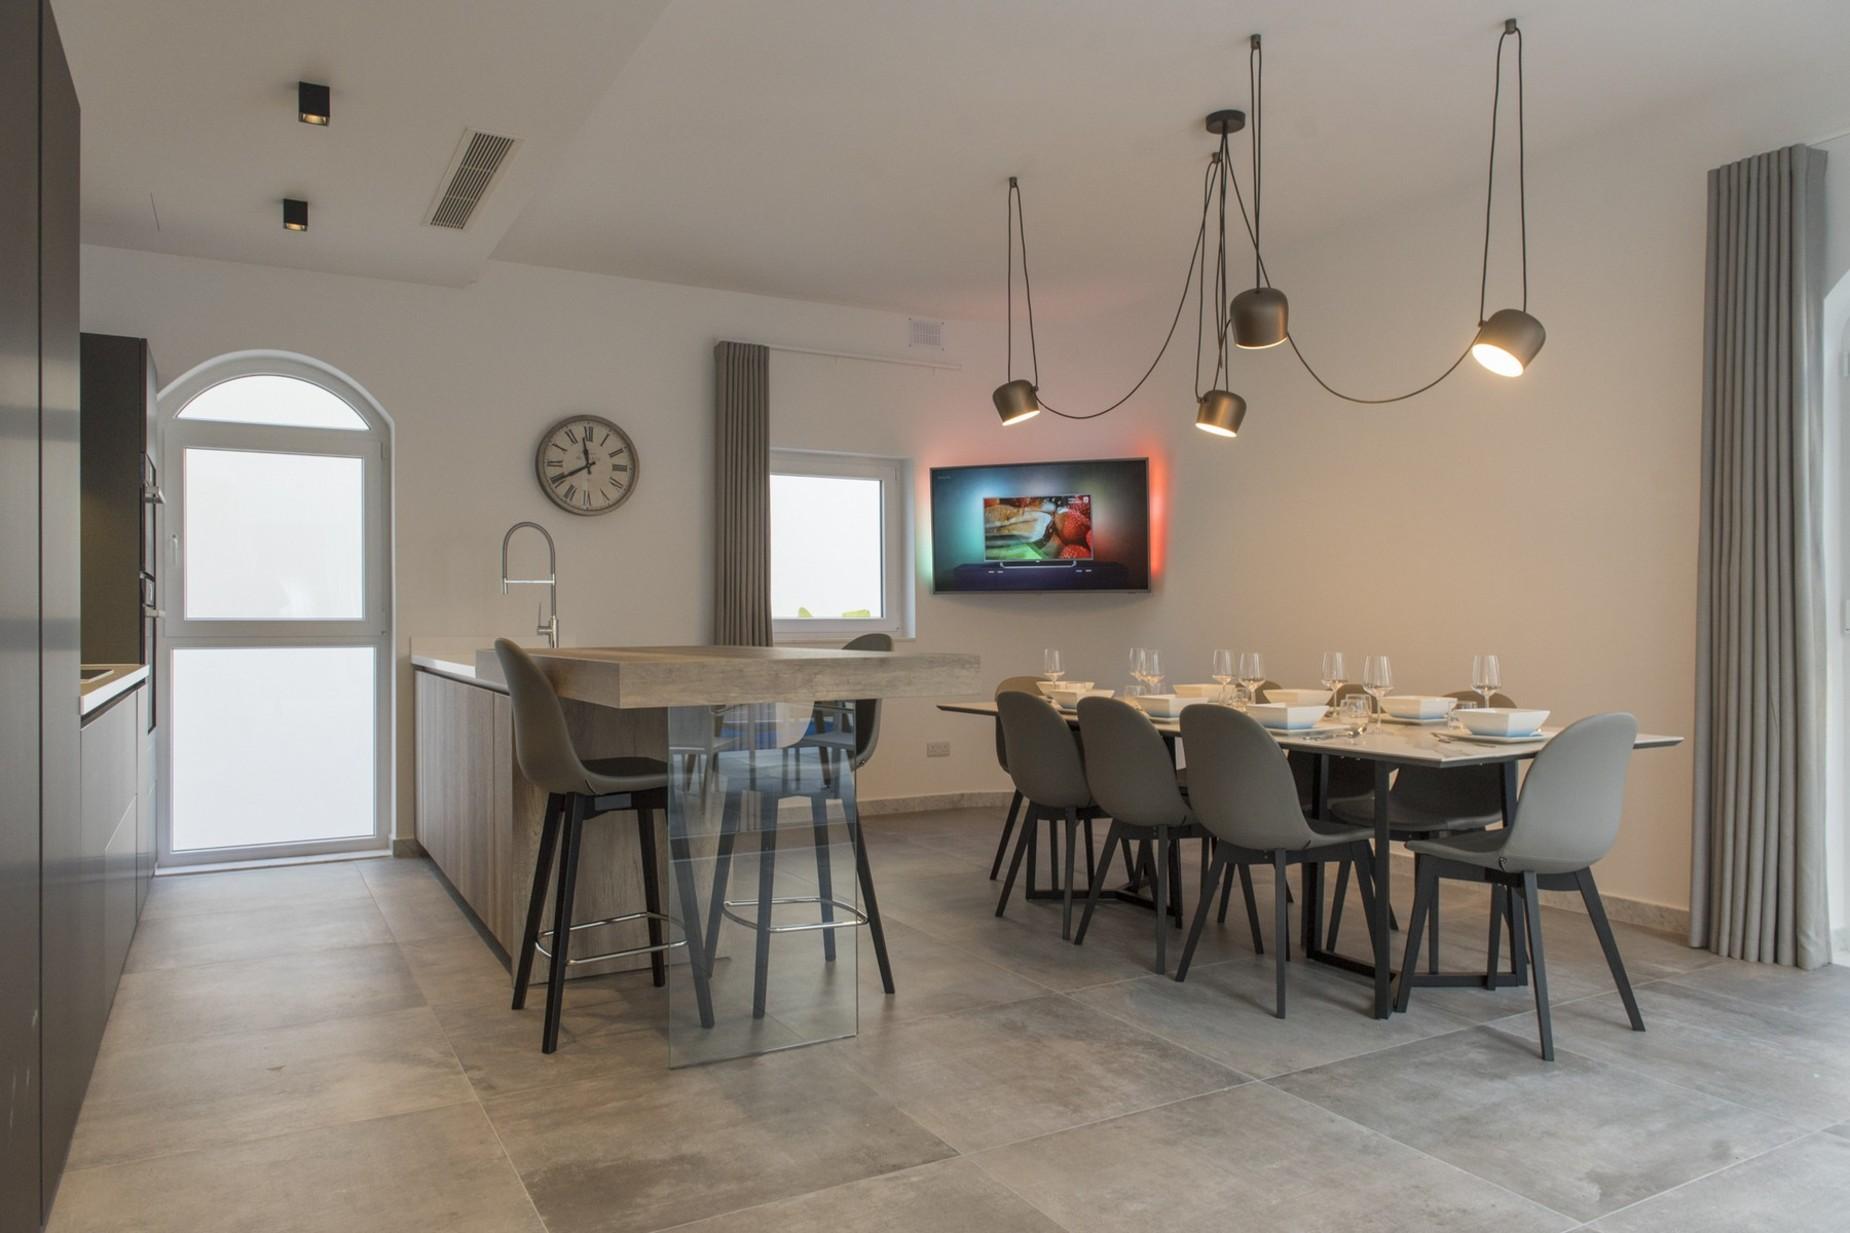 3 bed Villa For Rent in Ibragg, Ibragg - thumb 5